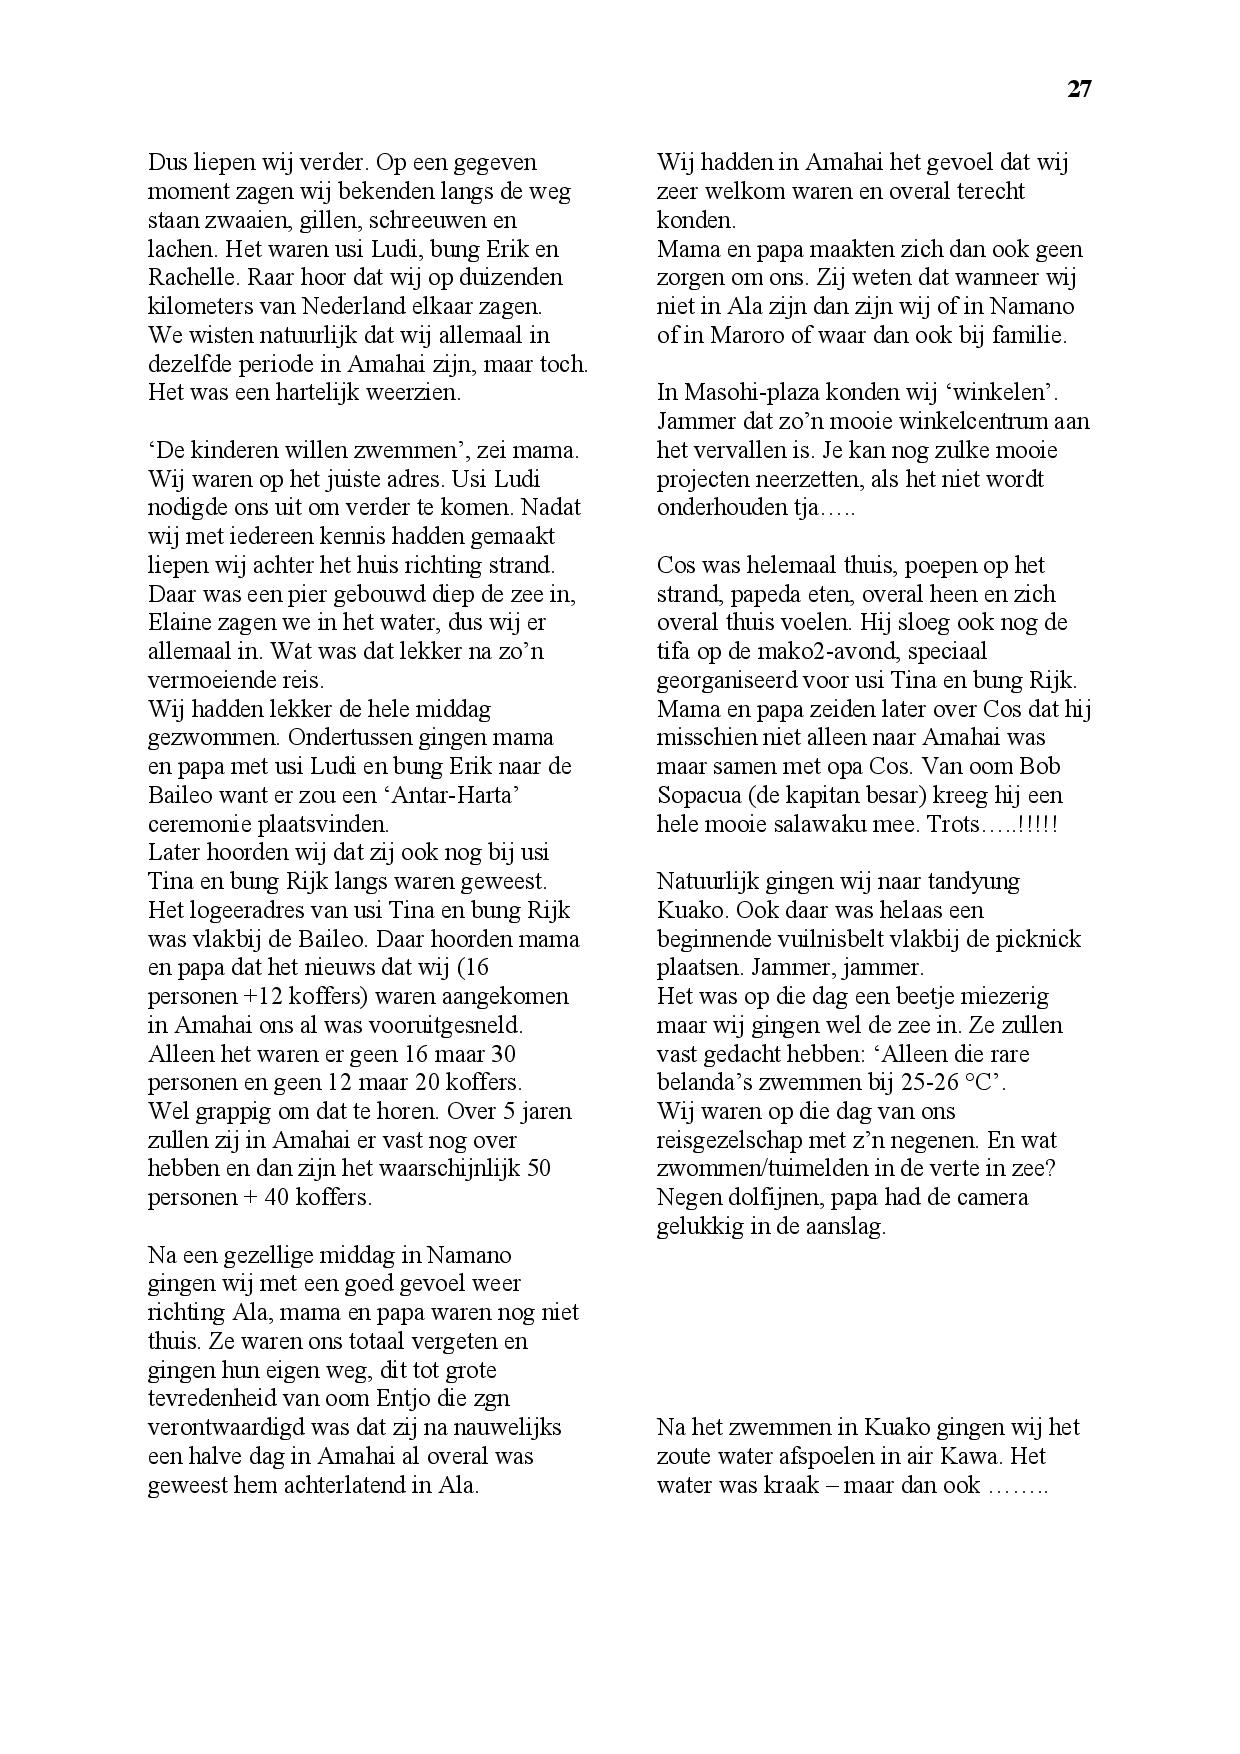 Saka Mese 3e jaargang nr. 02-2007 definitieve webversie-page-027